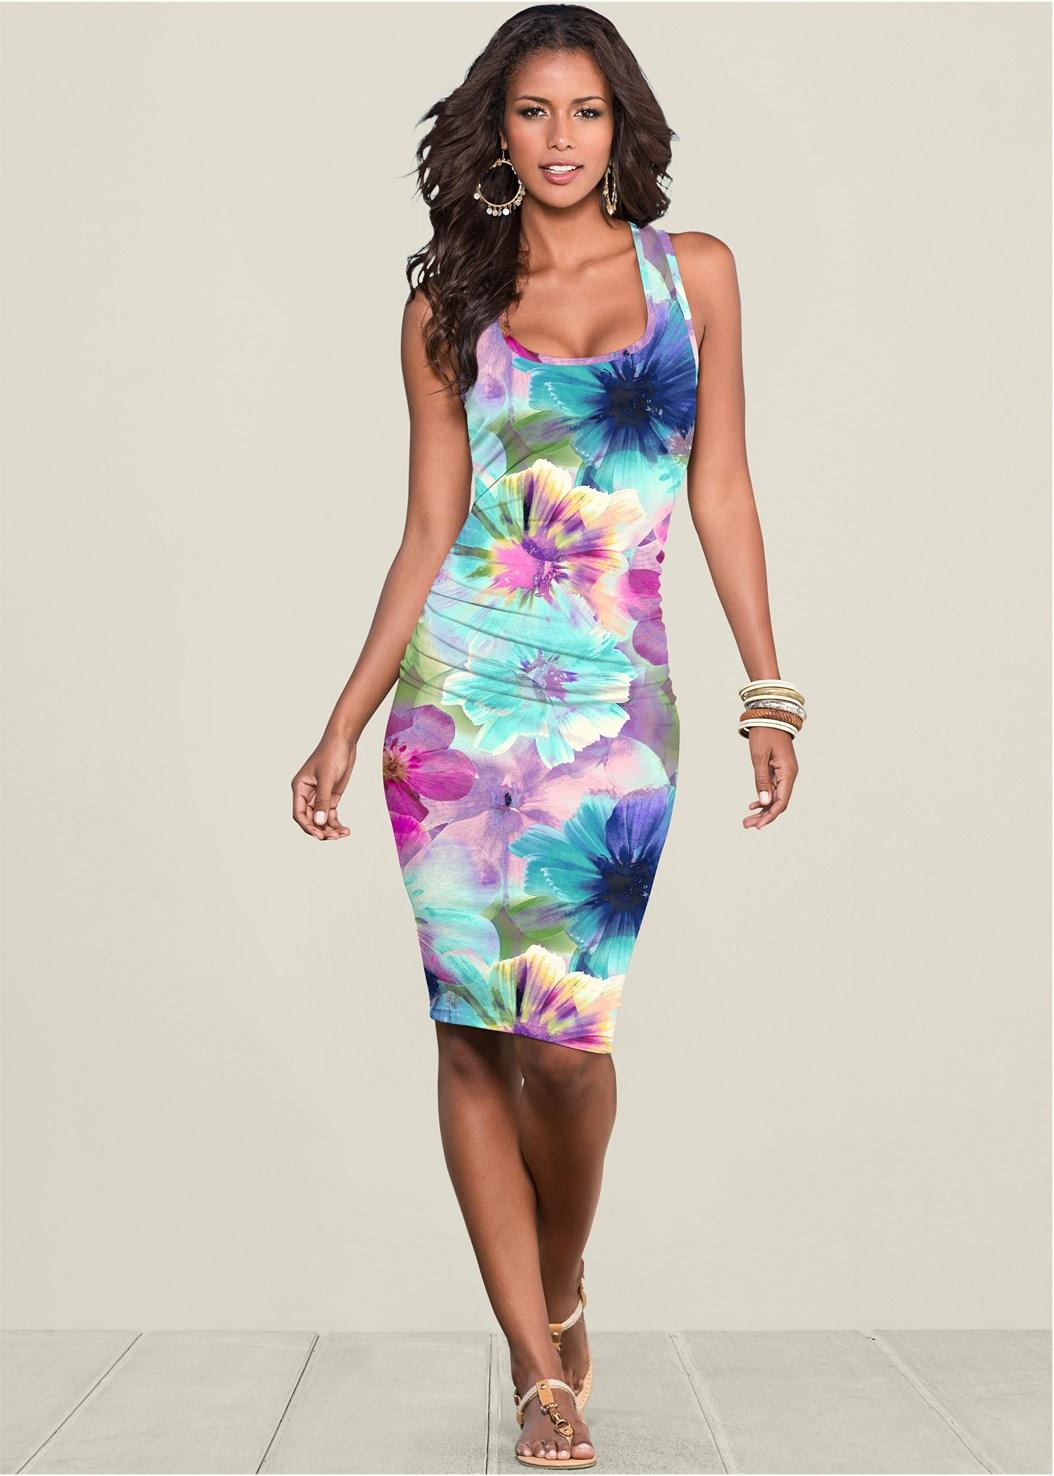 Ruched Print Tank Dress,Seamless Unlined Bra,Rhinestone Thong Sandal,Hoop Earrings